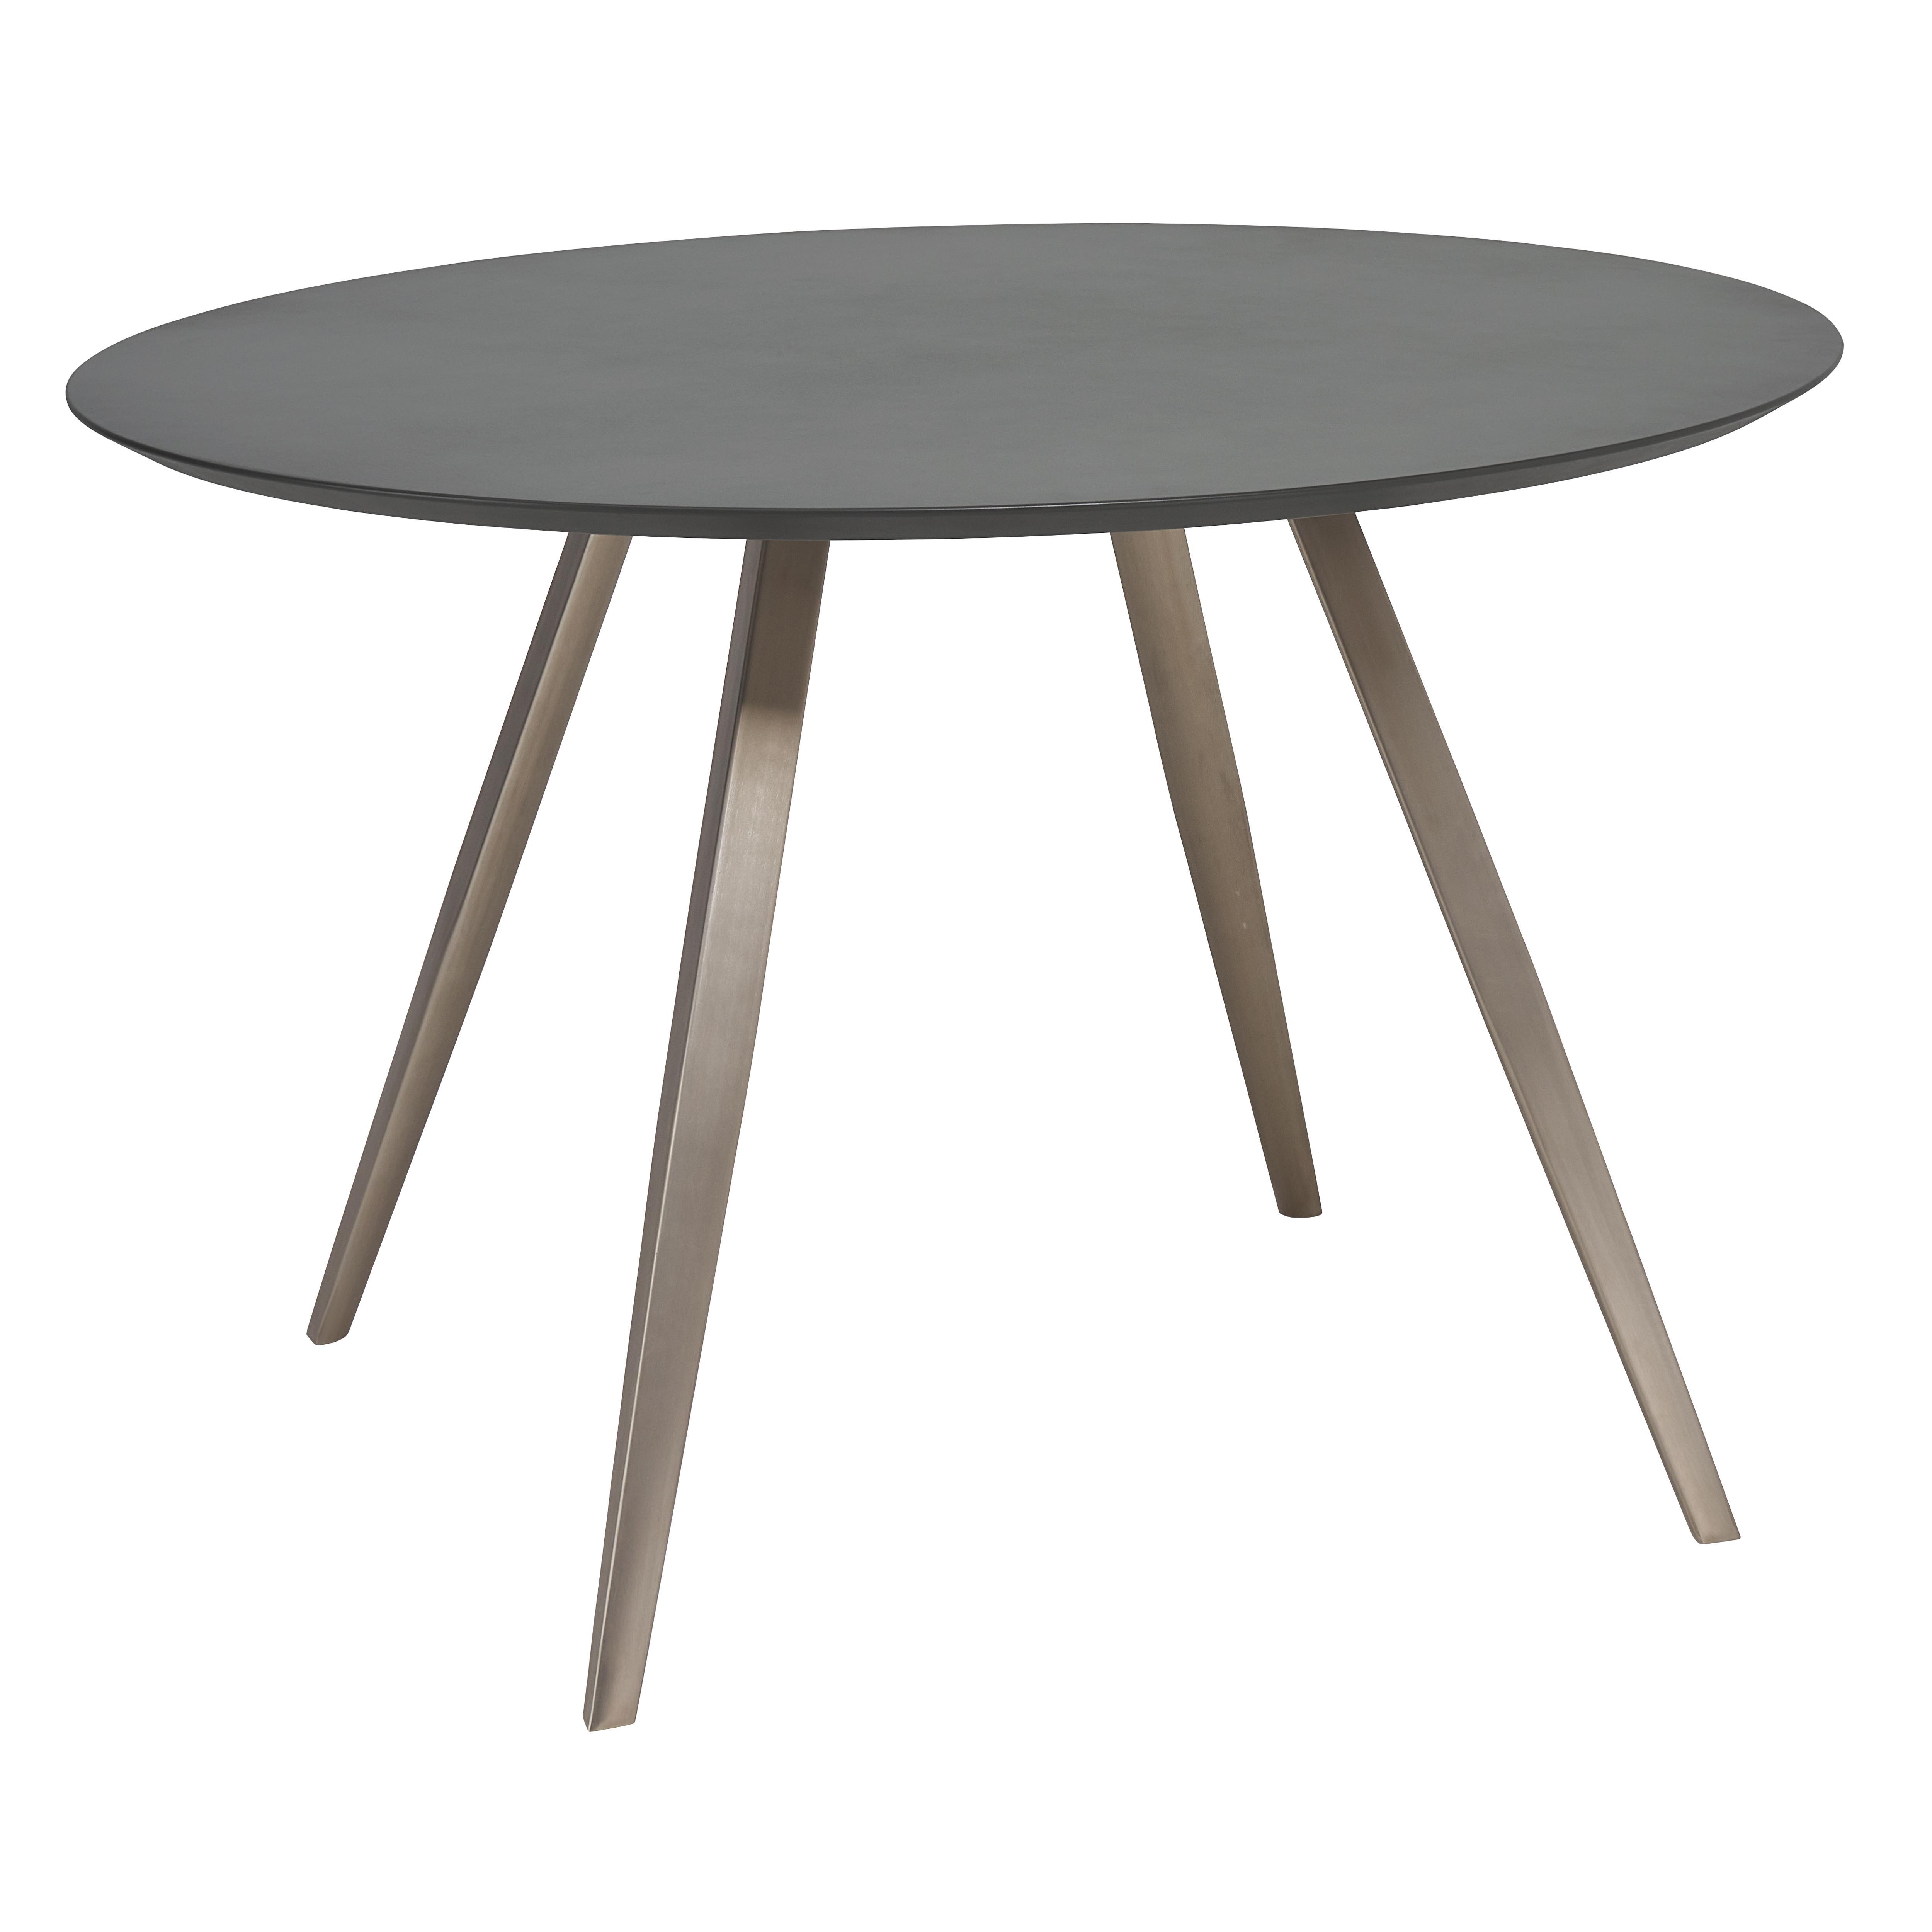 Passare round 4-6 seater dining table 120cm grey